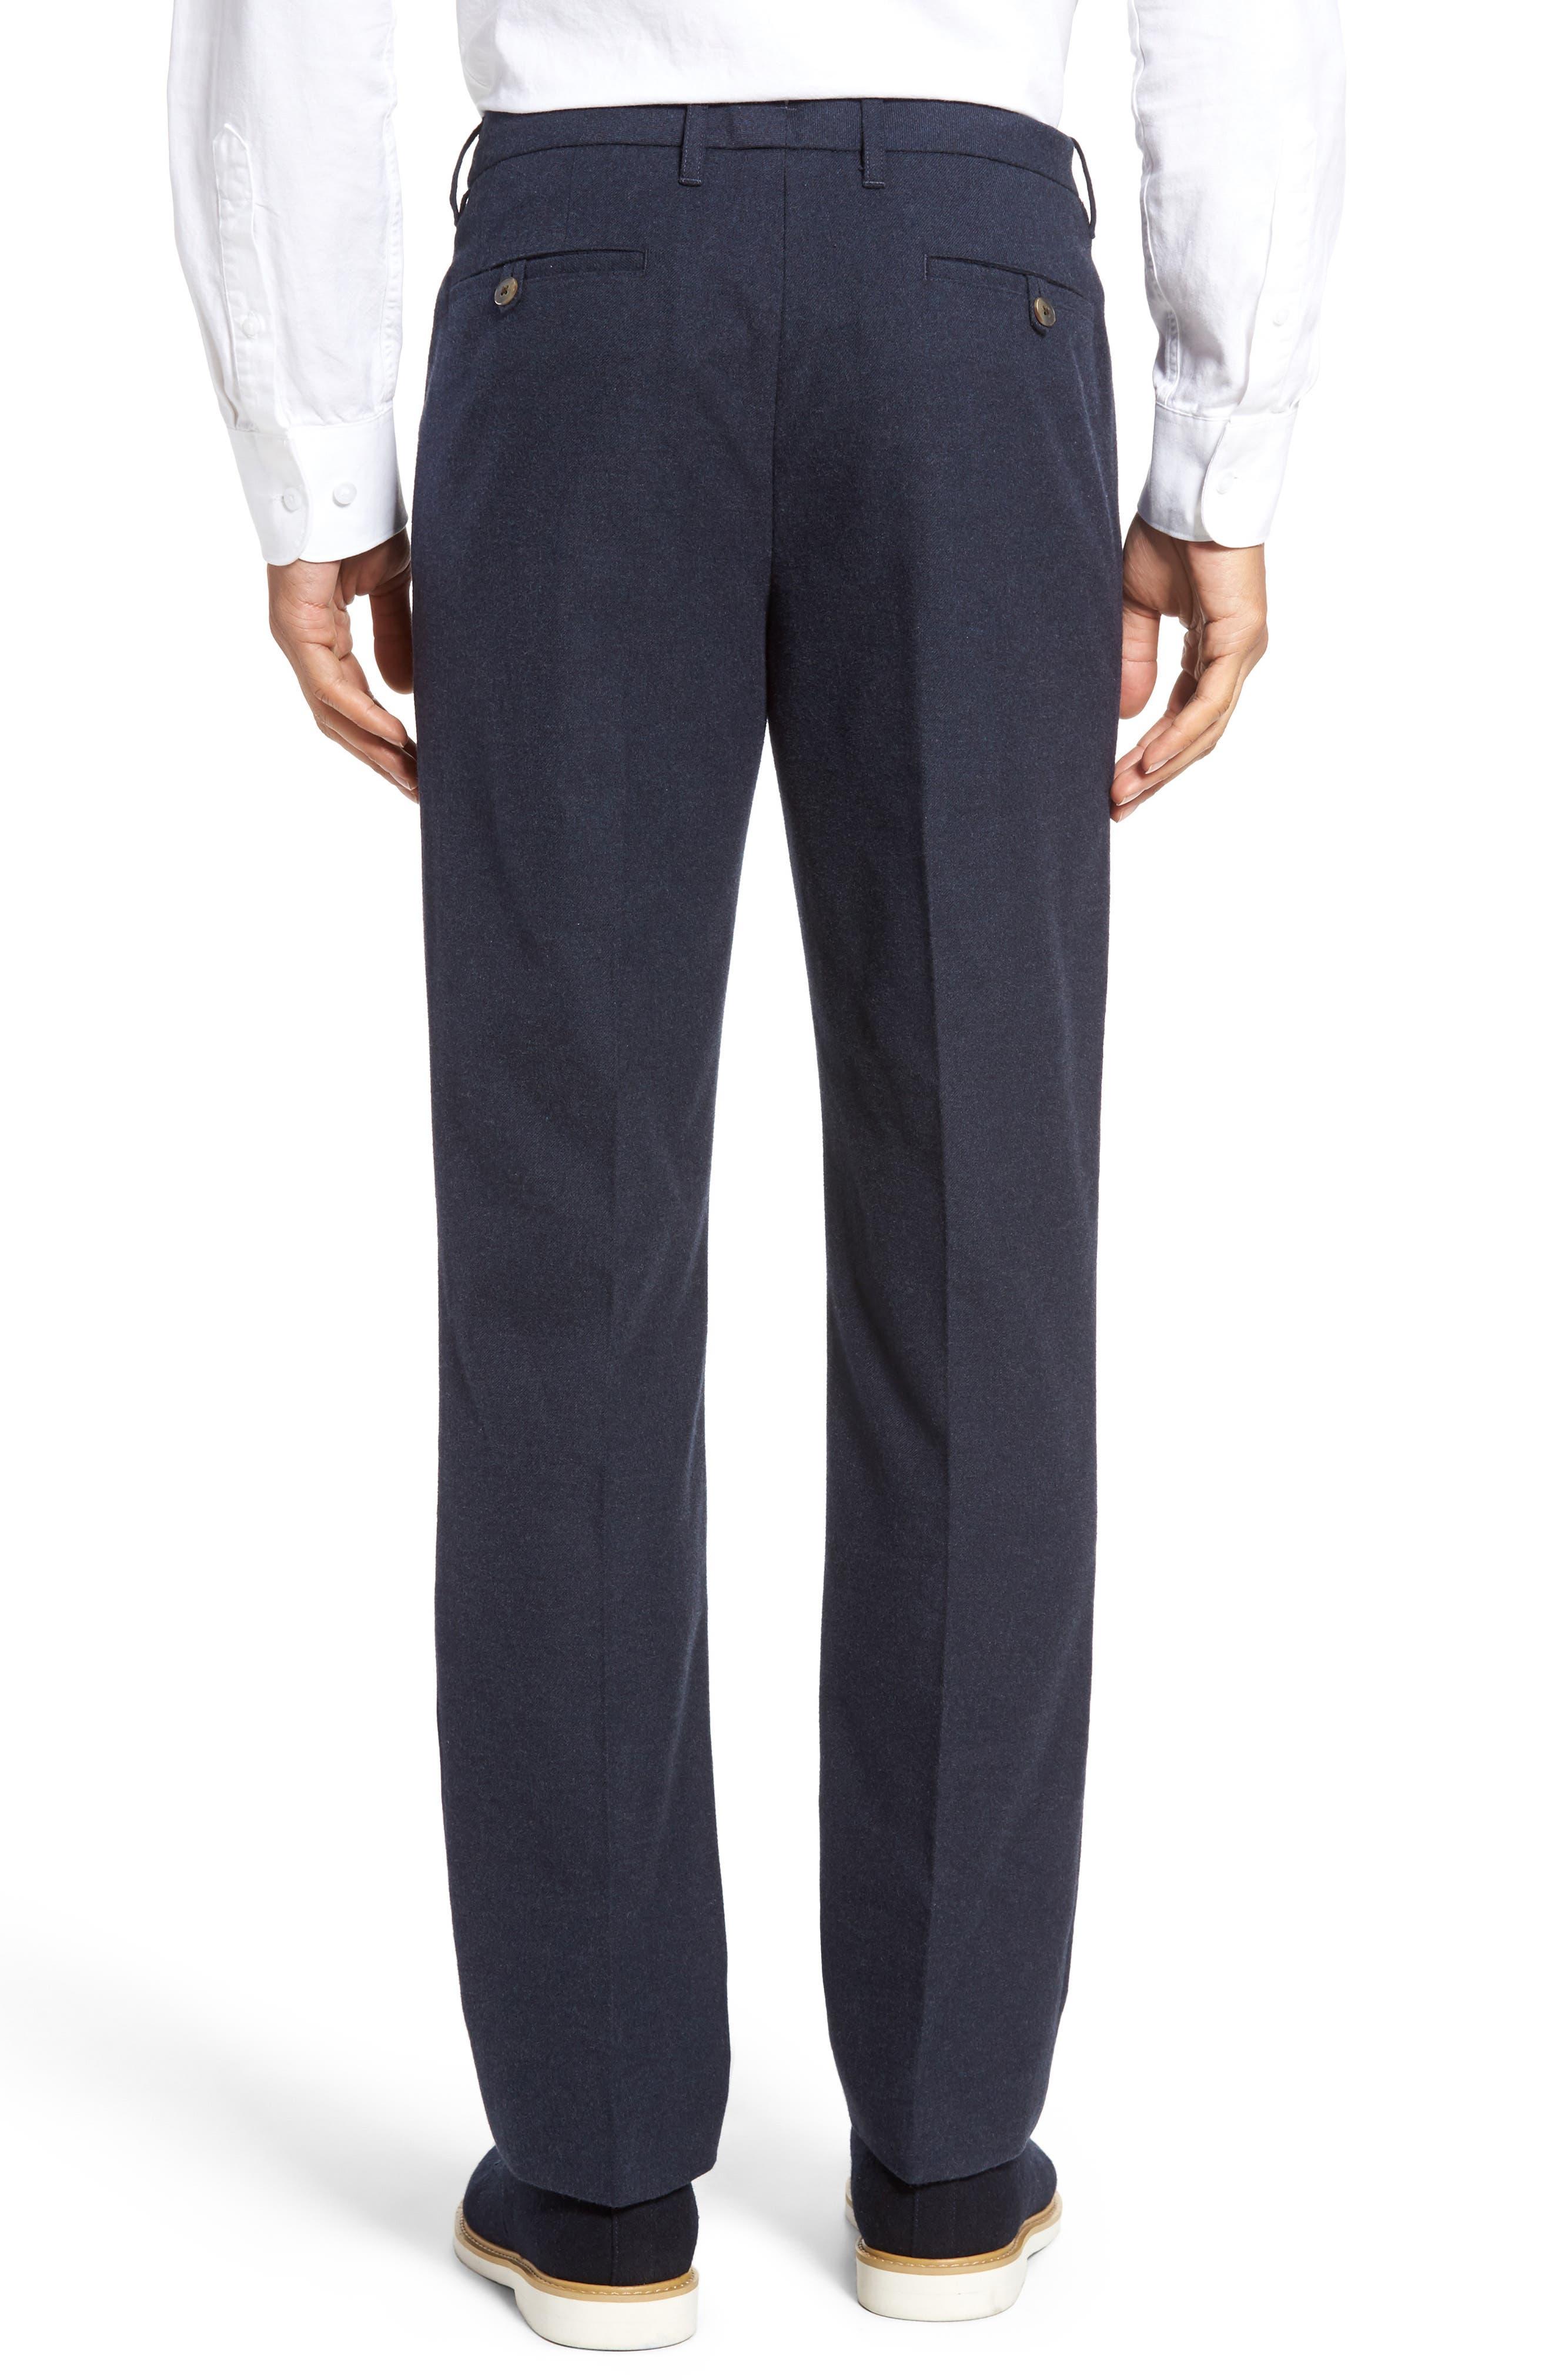 BONOBOS,                             Slim Fit Flannel Trousers,                             Alternate thumbnail 3, color,                             400